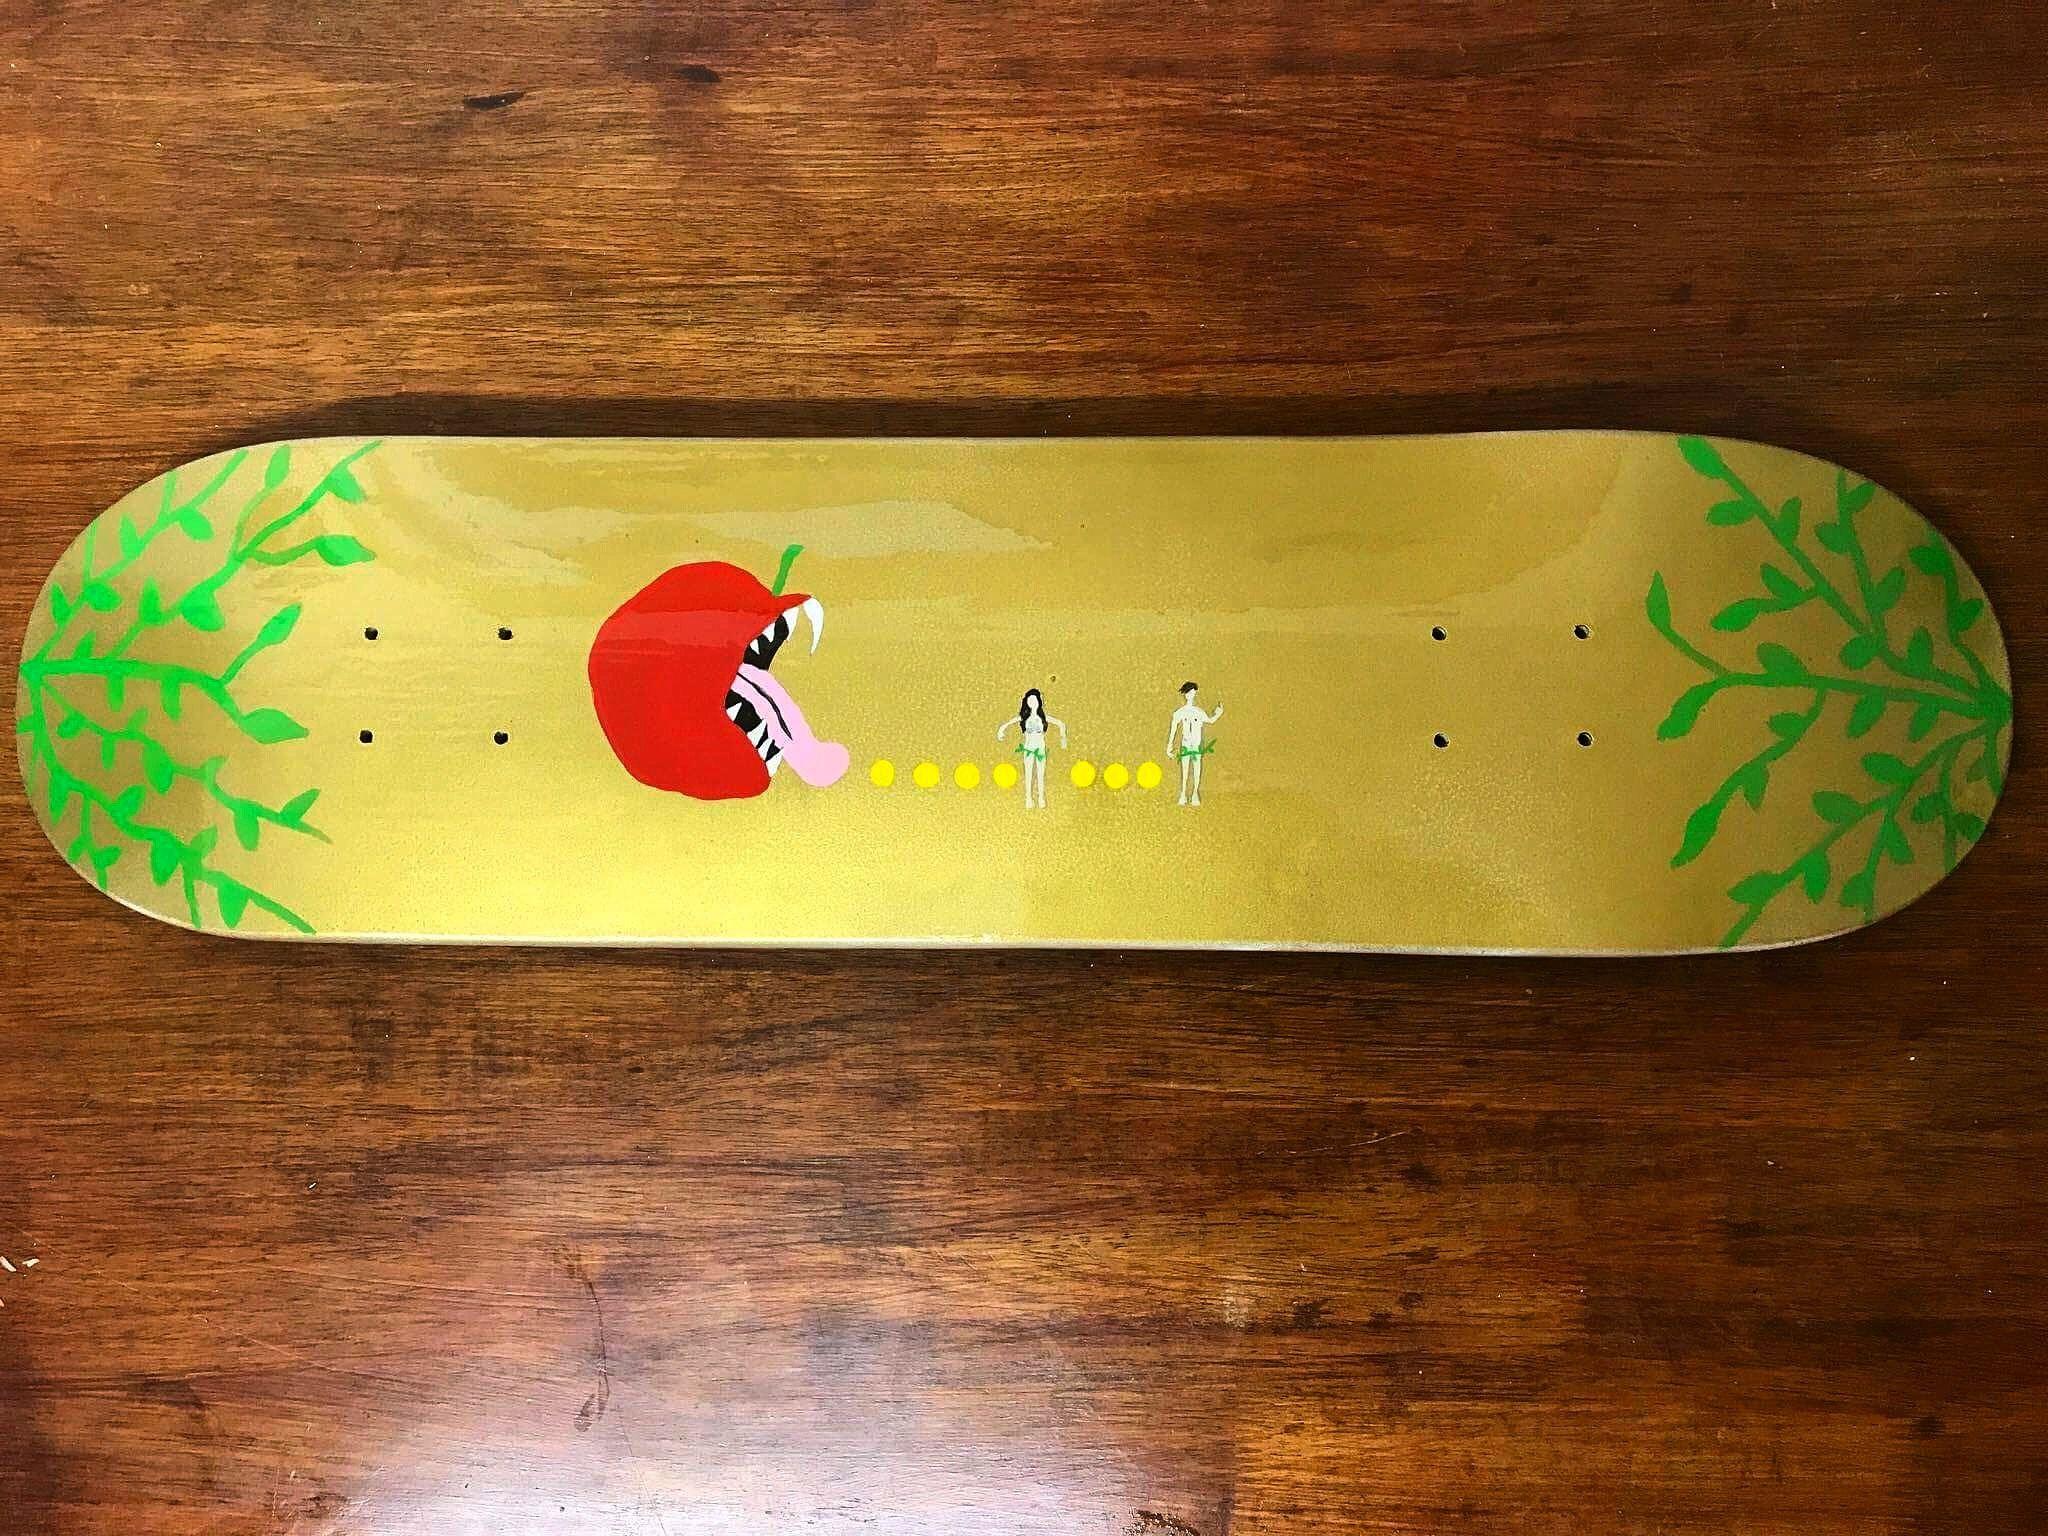 Adam and Eve, the forbidden Apple skateboard Dec, Molly Shortman ...